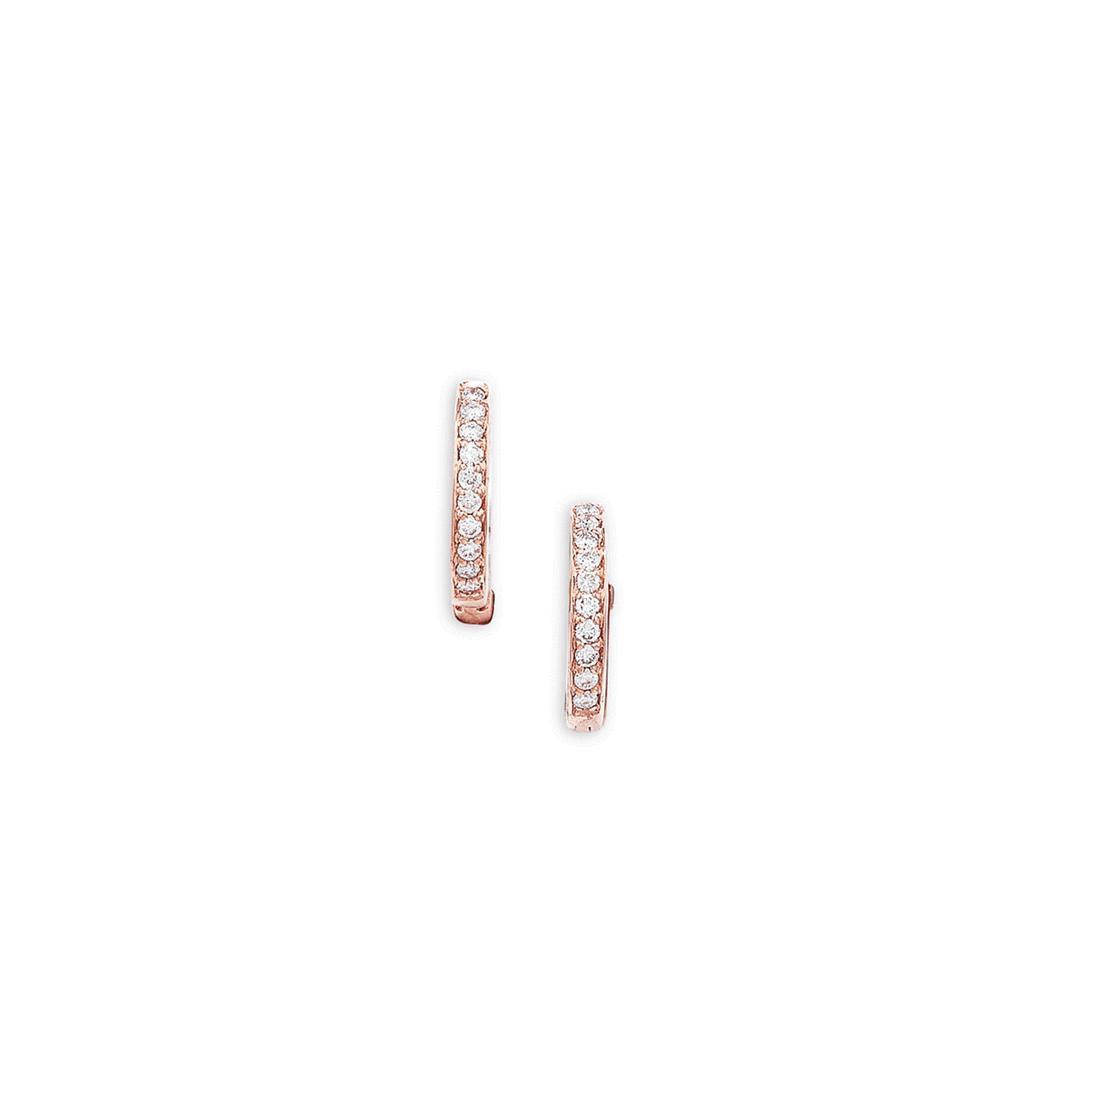 London Road Jewellery Portobello White Gold Meridian Diamond Earrings nHcKiX